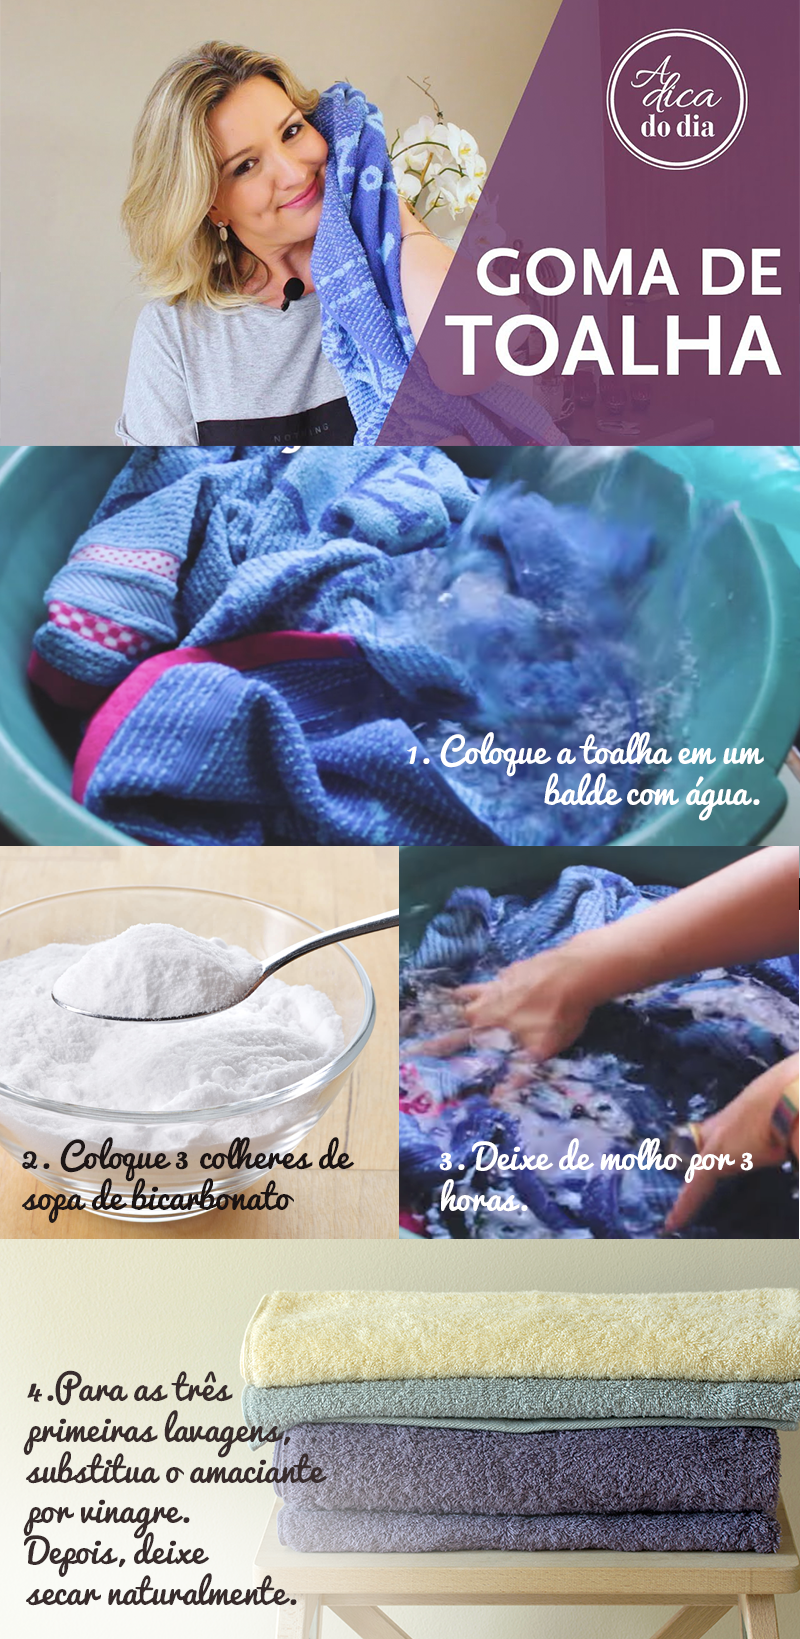 Tirar goma de toalha nova para deixá-la macia